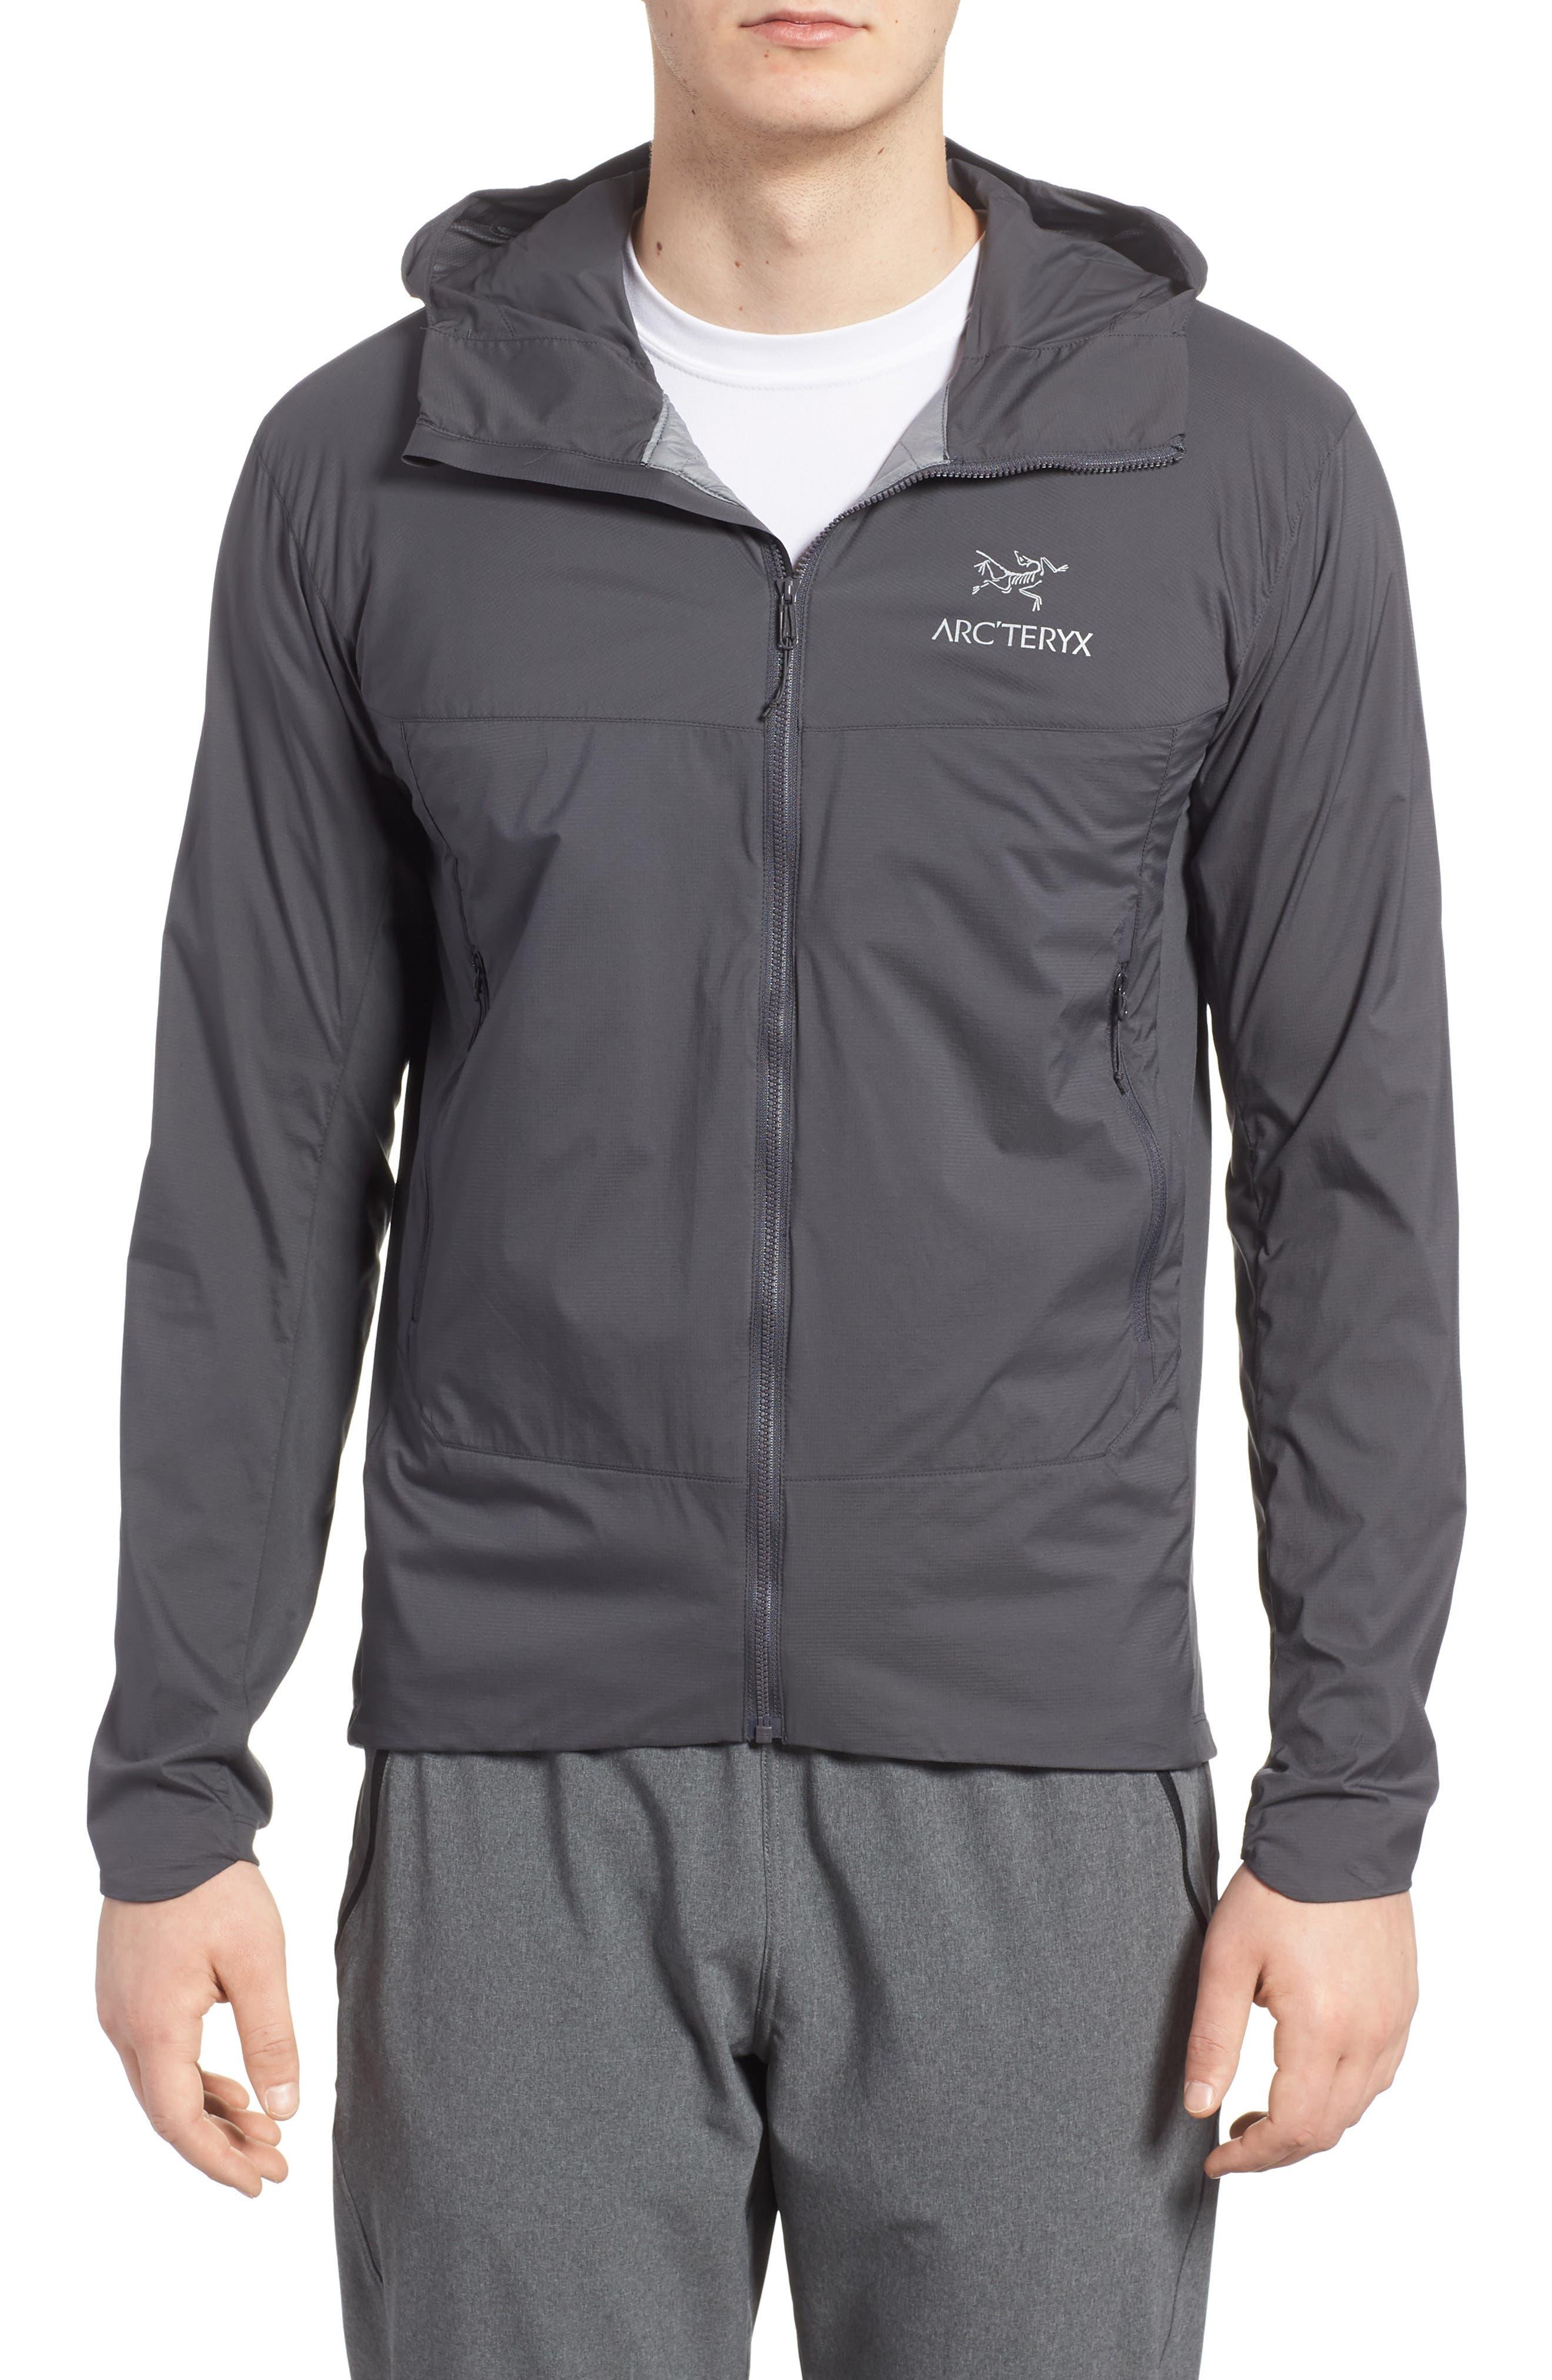 Arc'Teryx 'Atom SL' Trim Fit Water Resistant Lightweight Coreloft™ Jacket